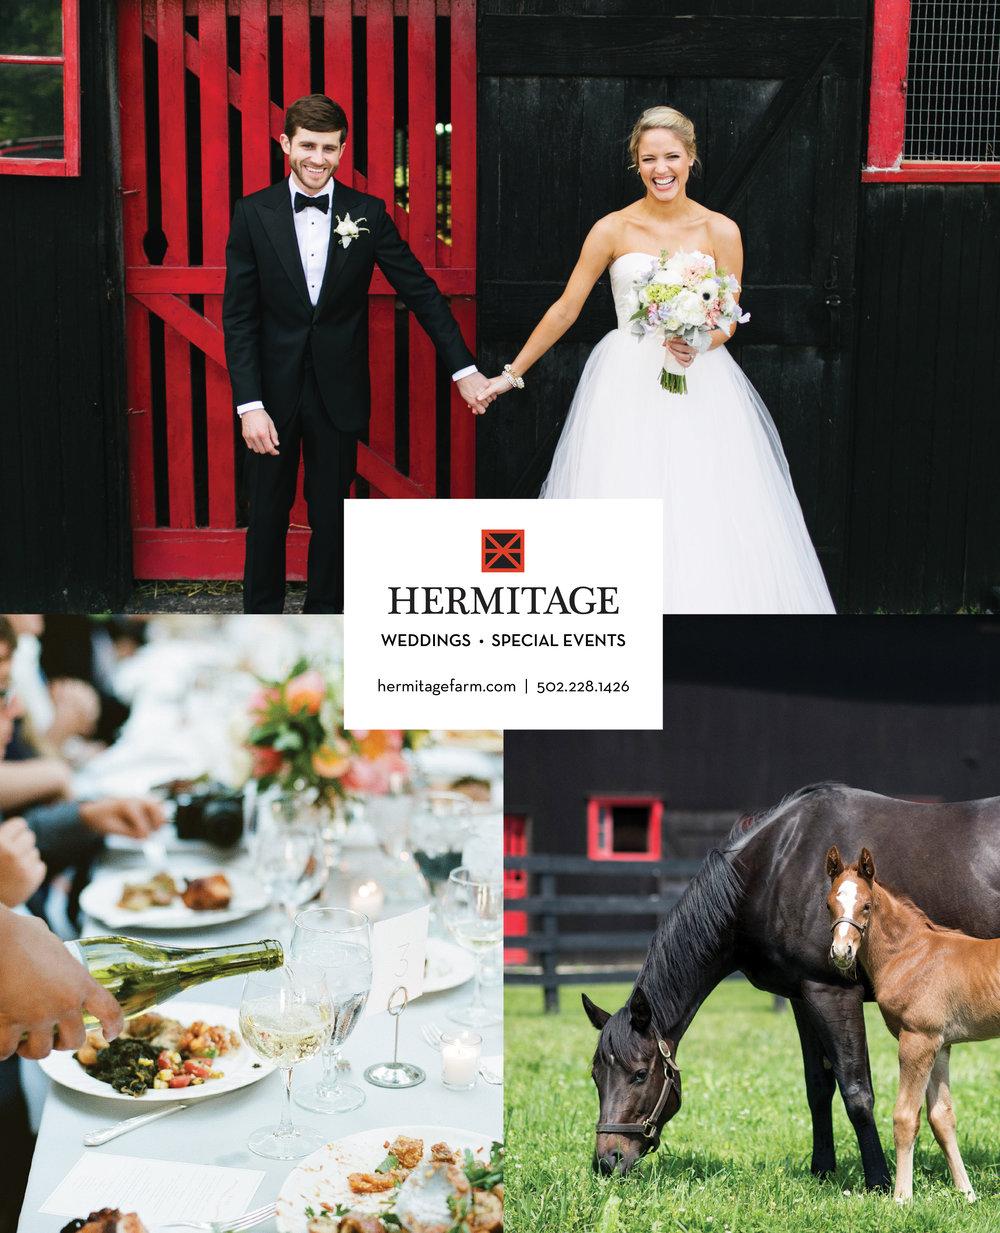 Hermitage - hermitagefarm.com